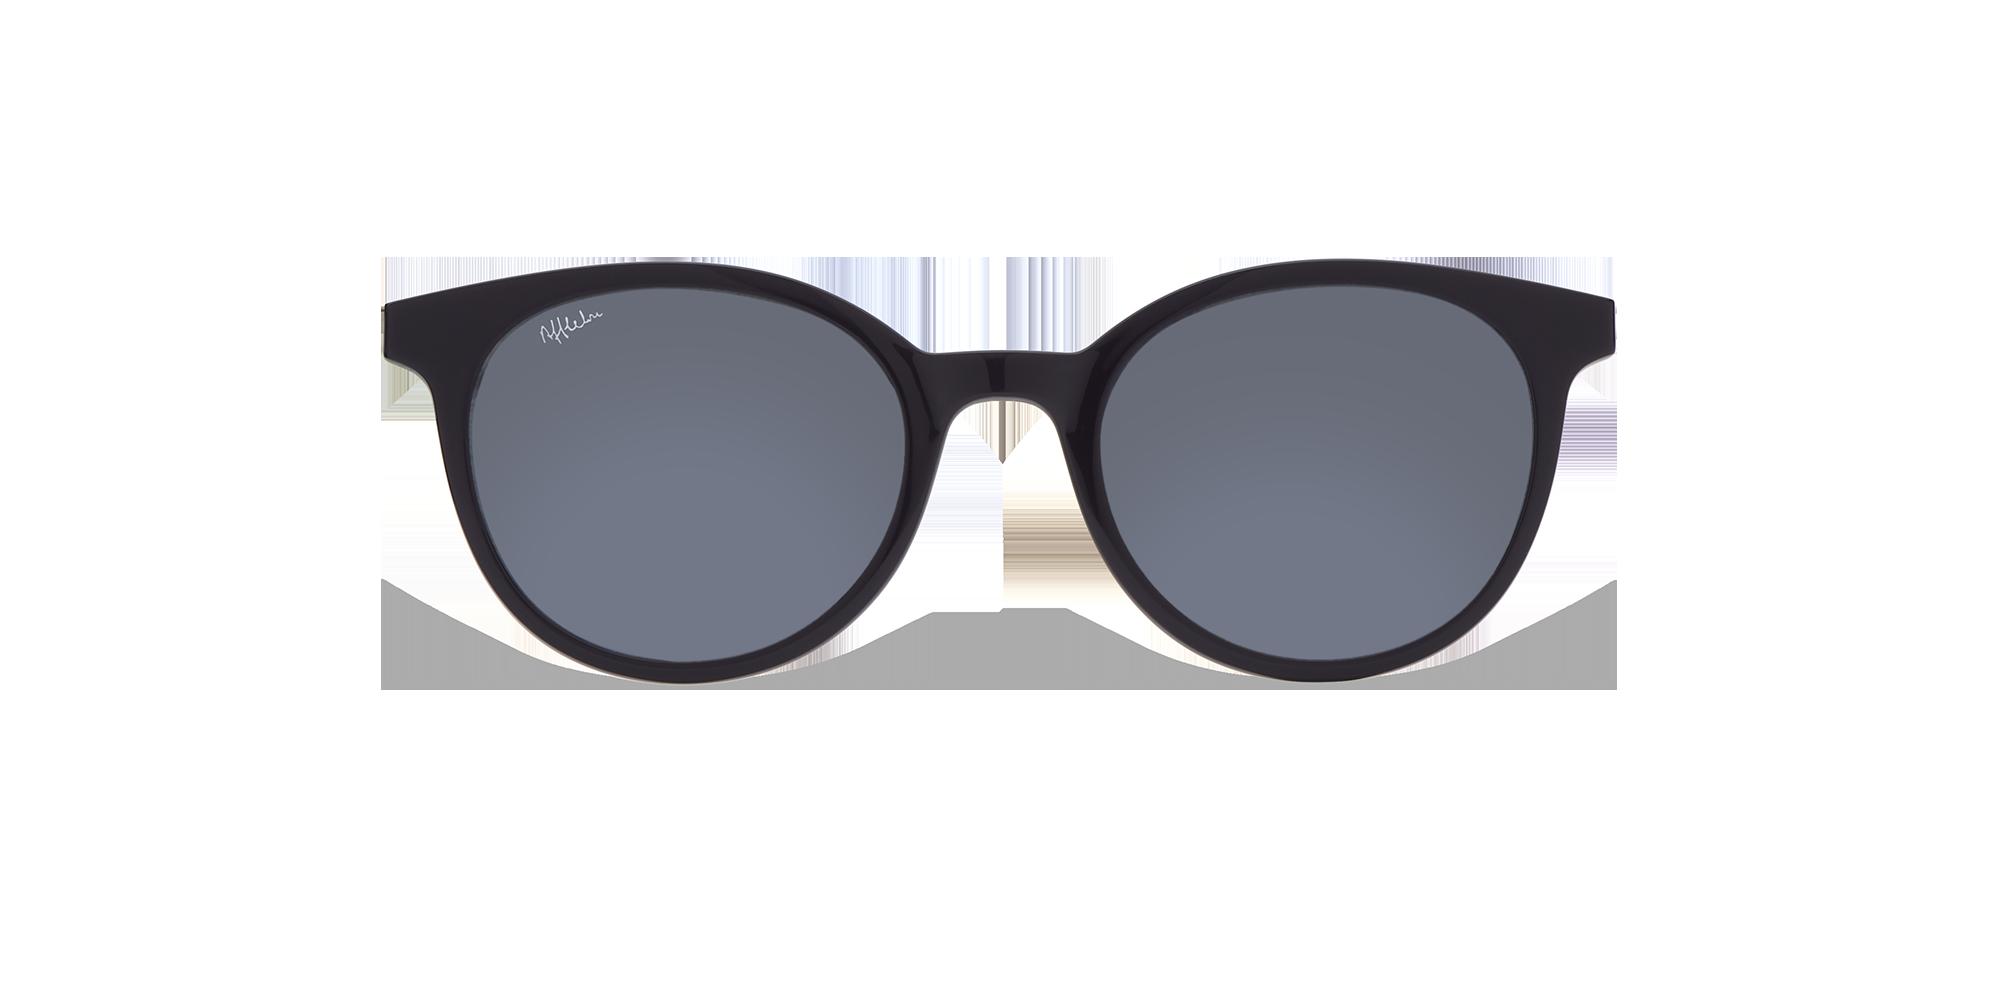 afflelou/france/products/smart_clip/clips_glasses/TMK36SUPU014819.png